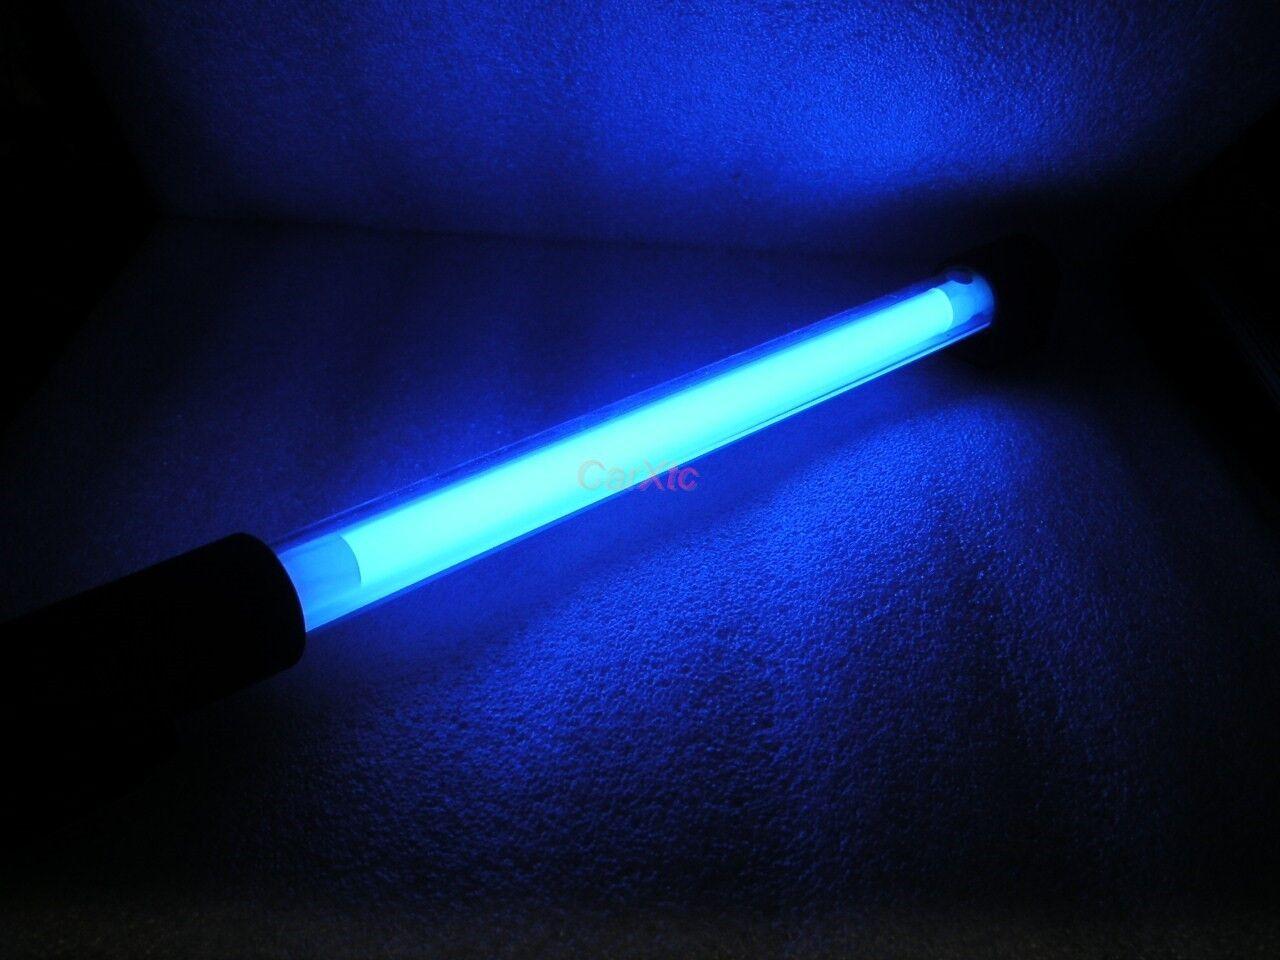 Neon Car Lights: 12 Inch Blue Neons - Glow N Street Neon Car Lighting